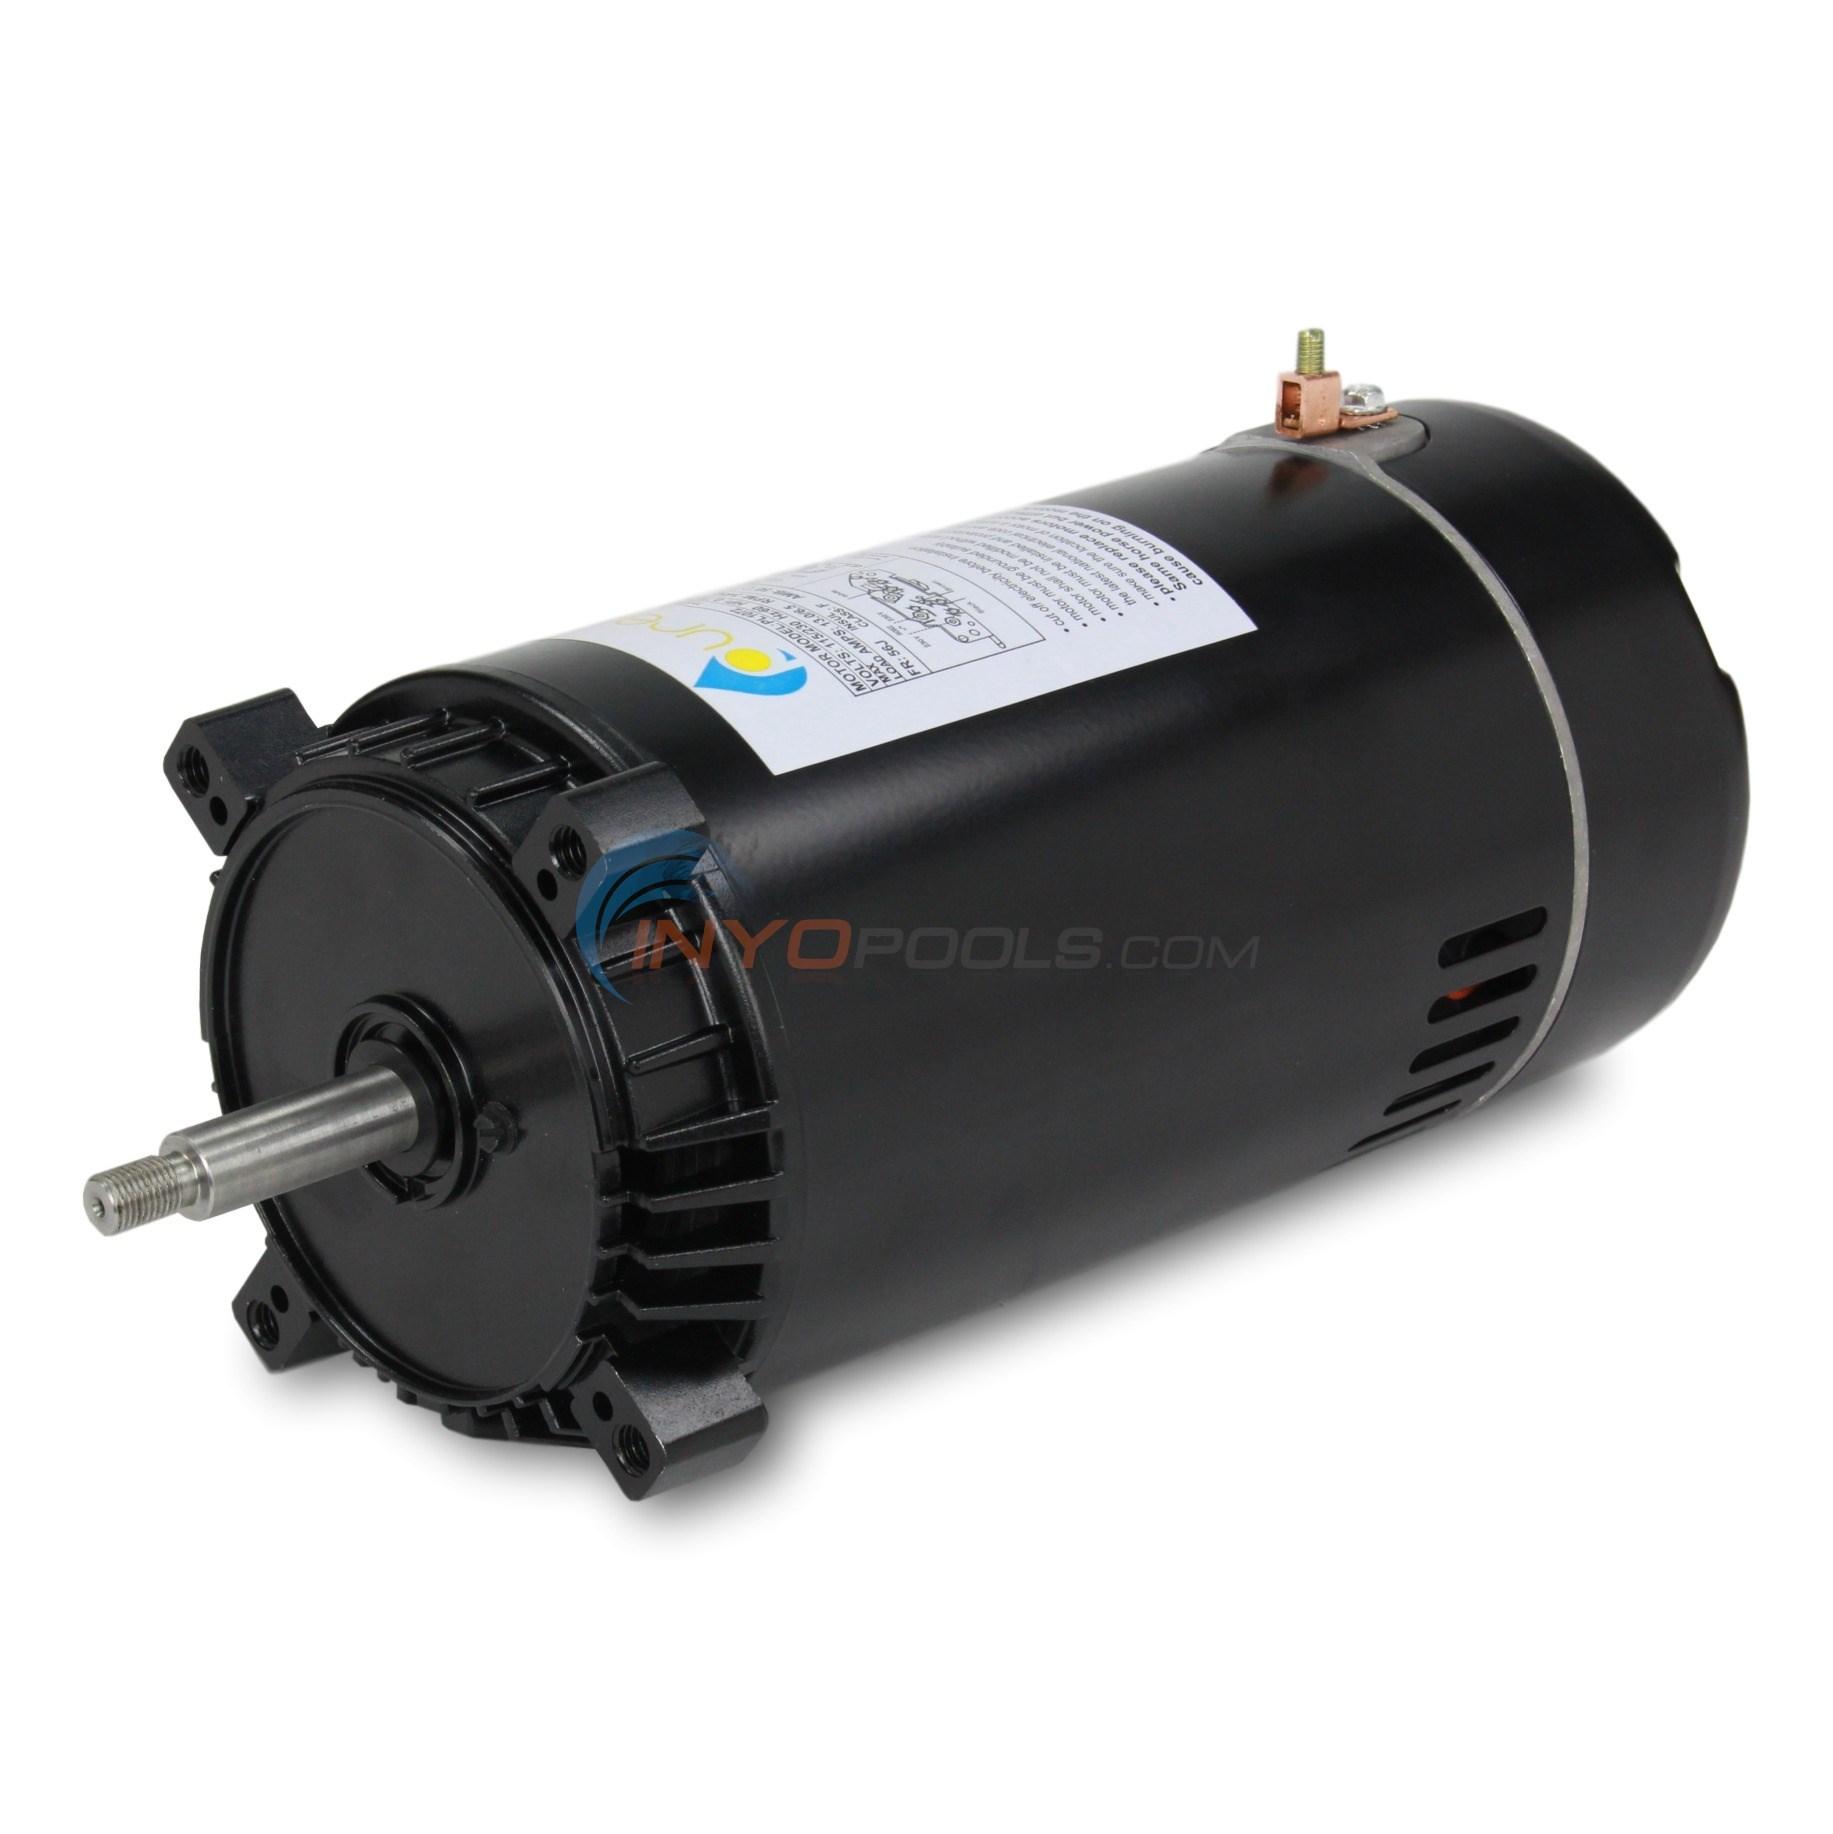 Pool Pump Motor Sp1610z1m Diagram House Wiring Symbols Emerson Pureline 1 5 Hp Round Flange 56j Pl1152 Inyopools Com Rh Ao Smith Motors